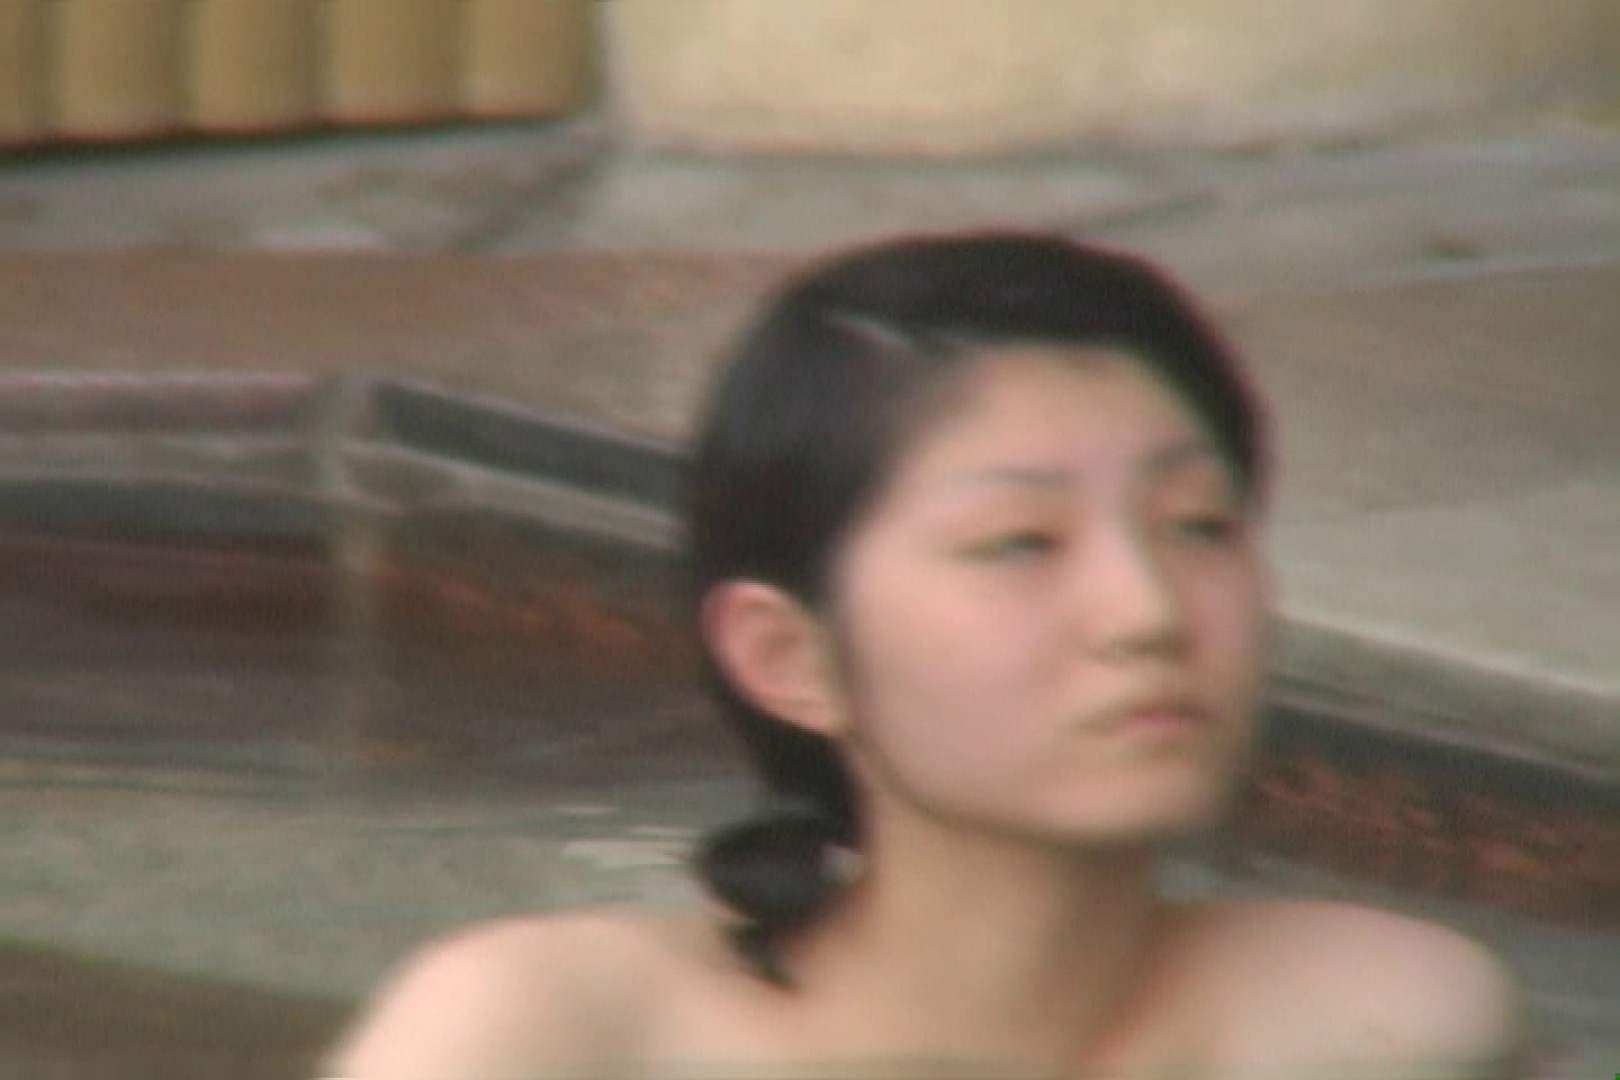 Aquaな露天風呂Vol.579 OL女体  72連発 54